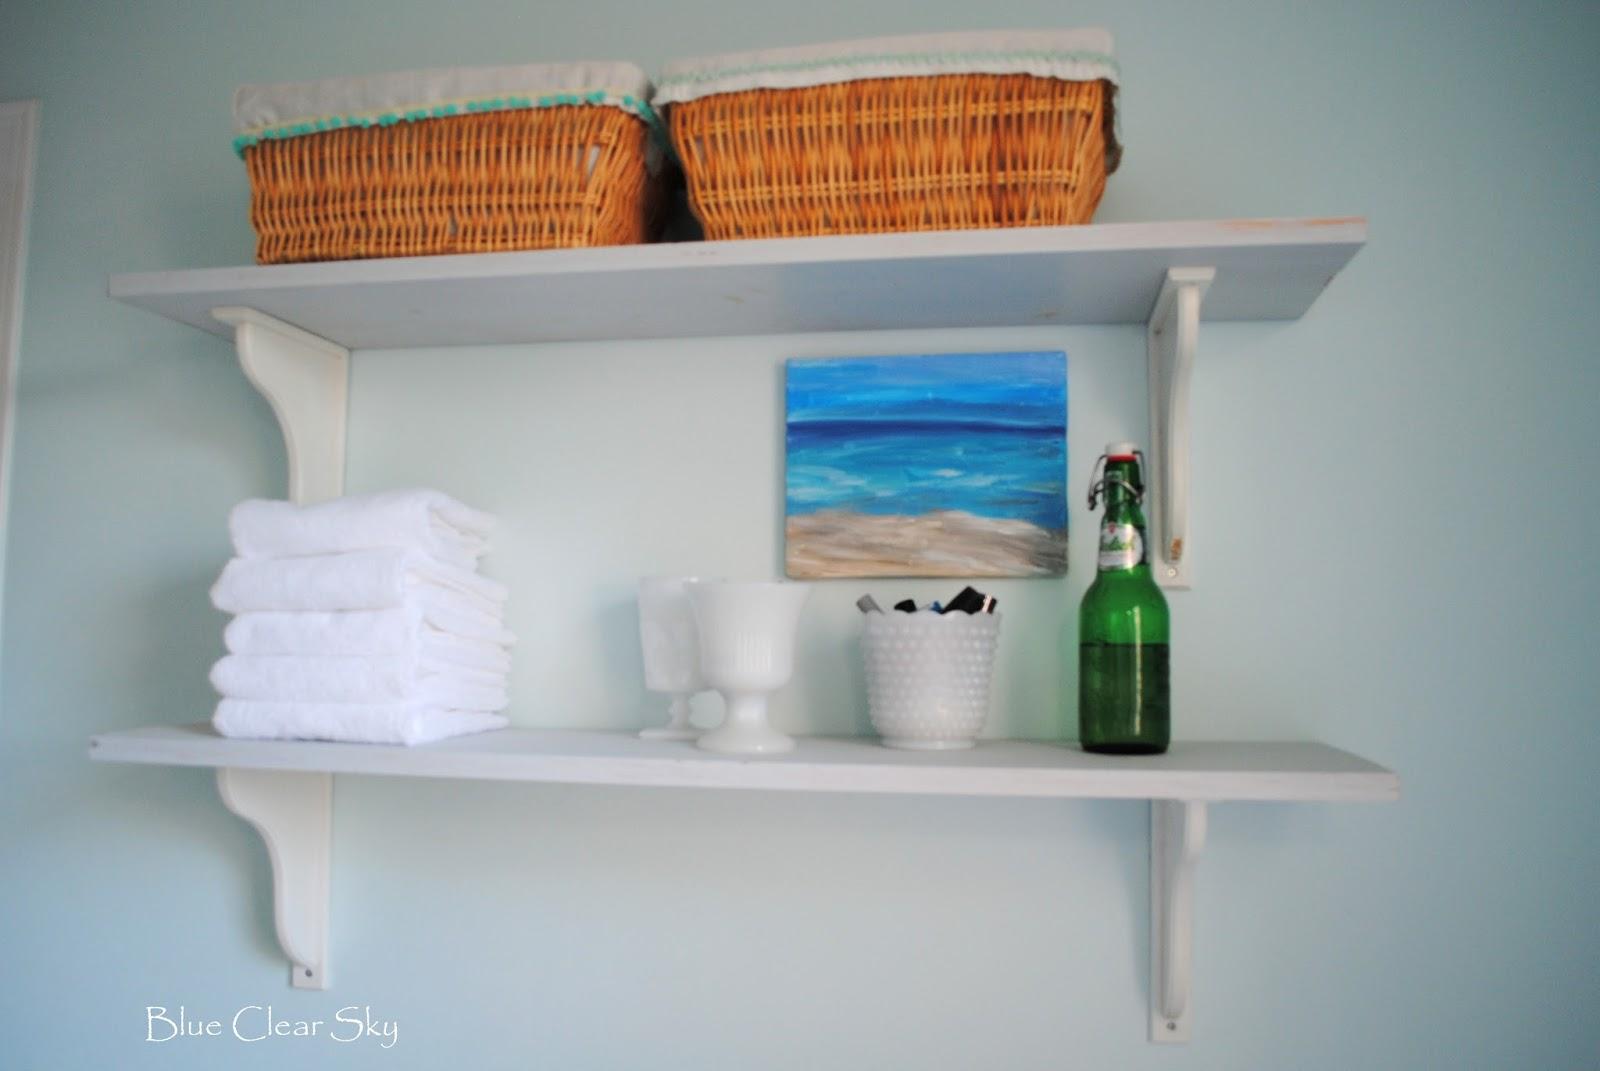 Rustic Maple: Simple Master Bathroom Shelves